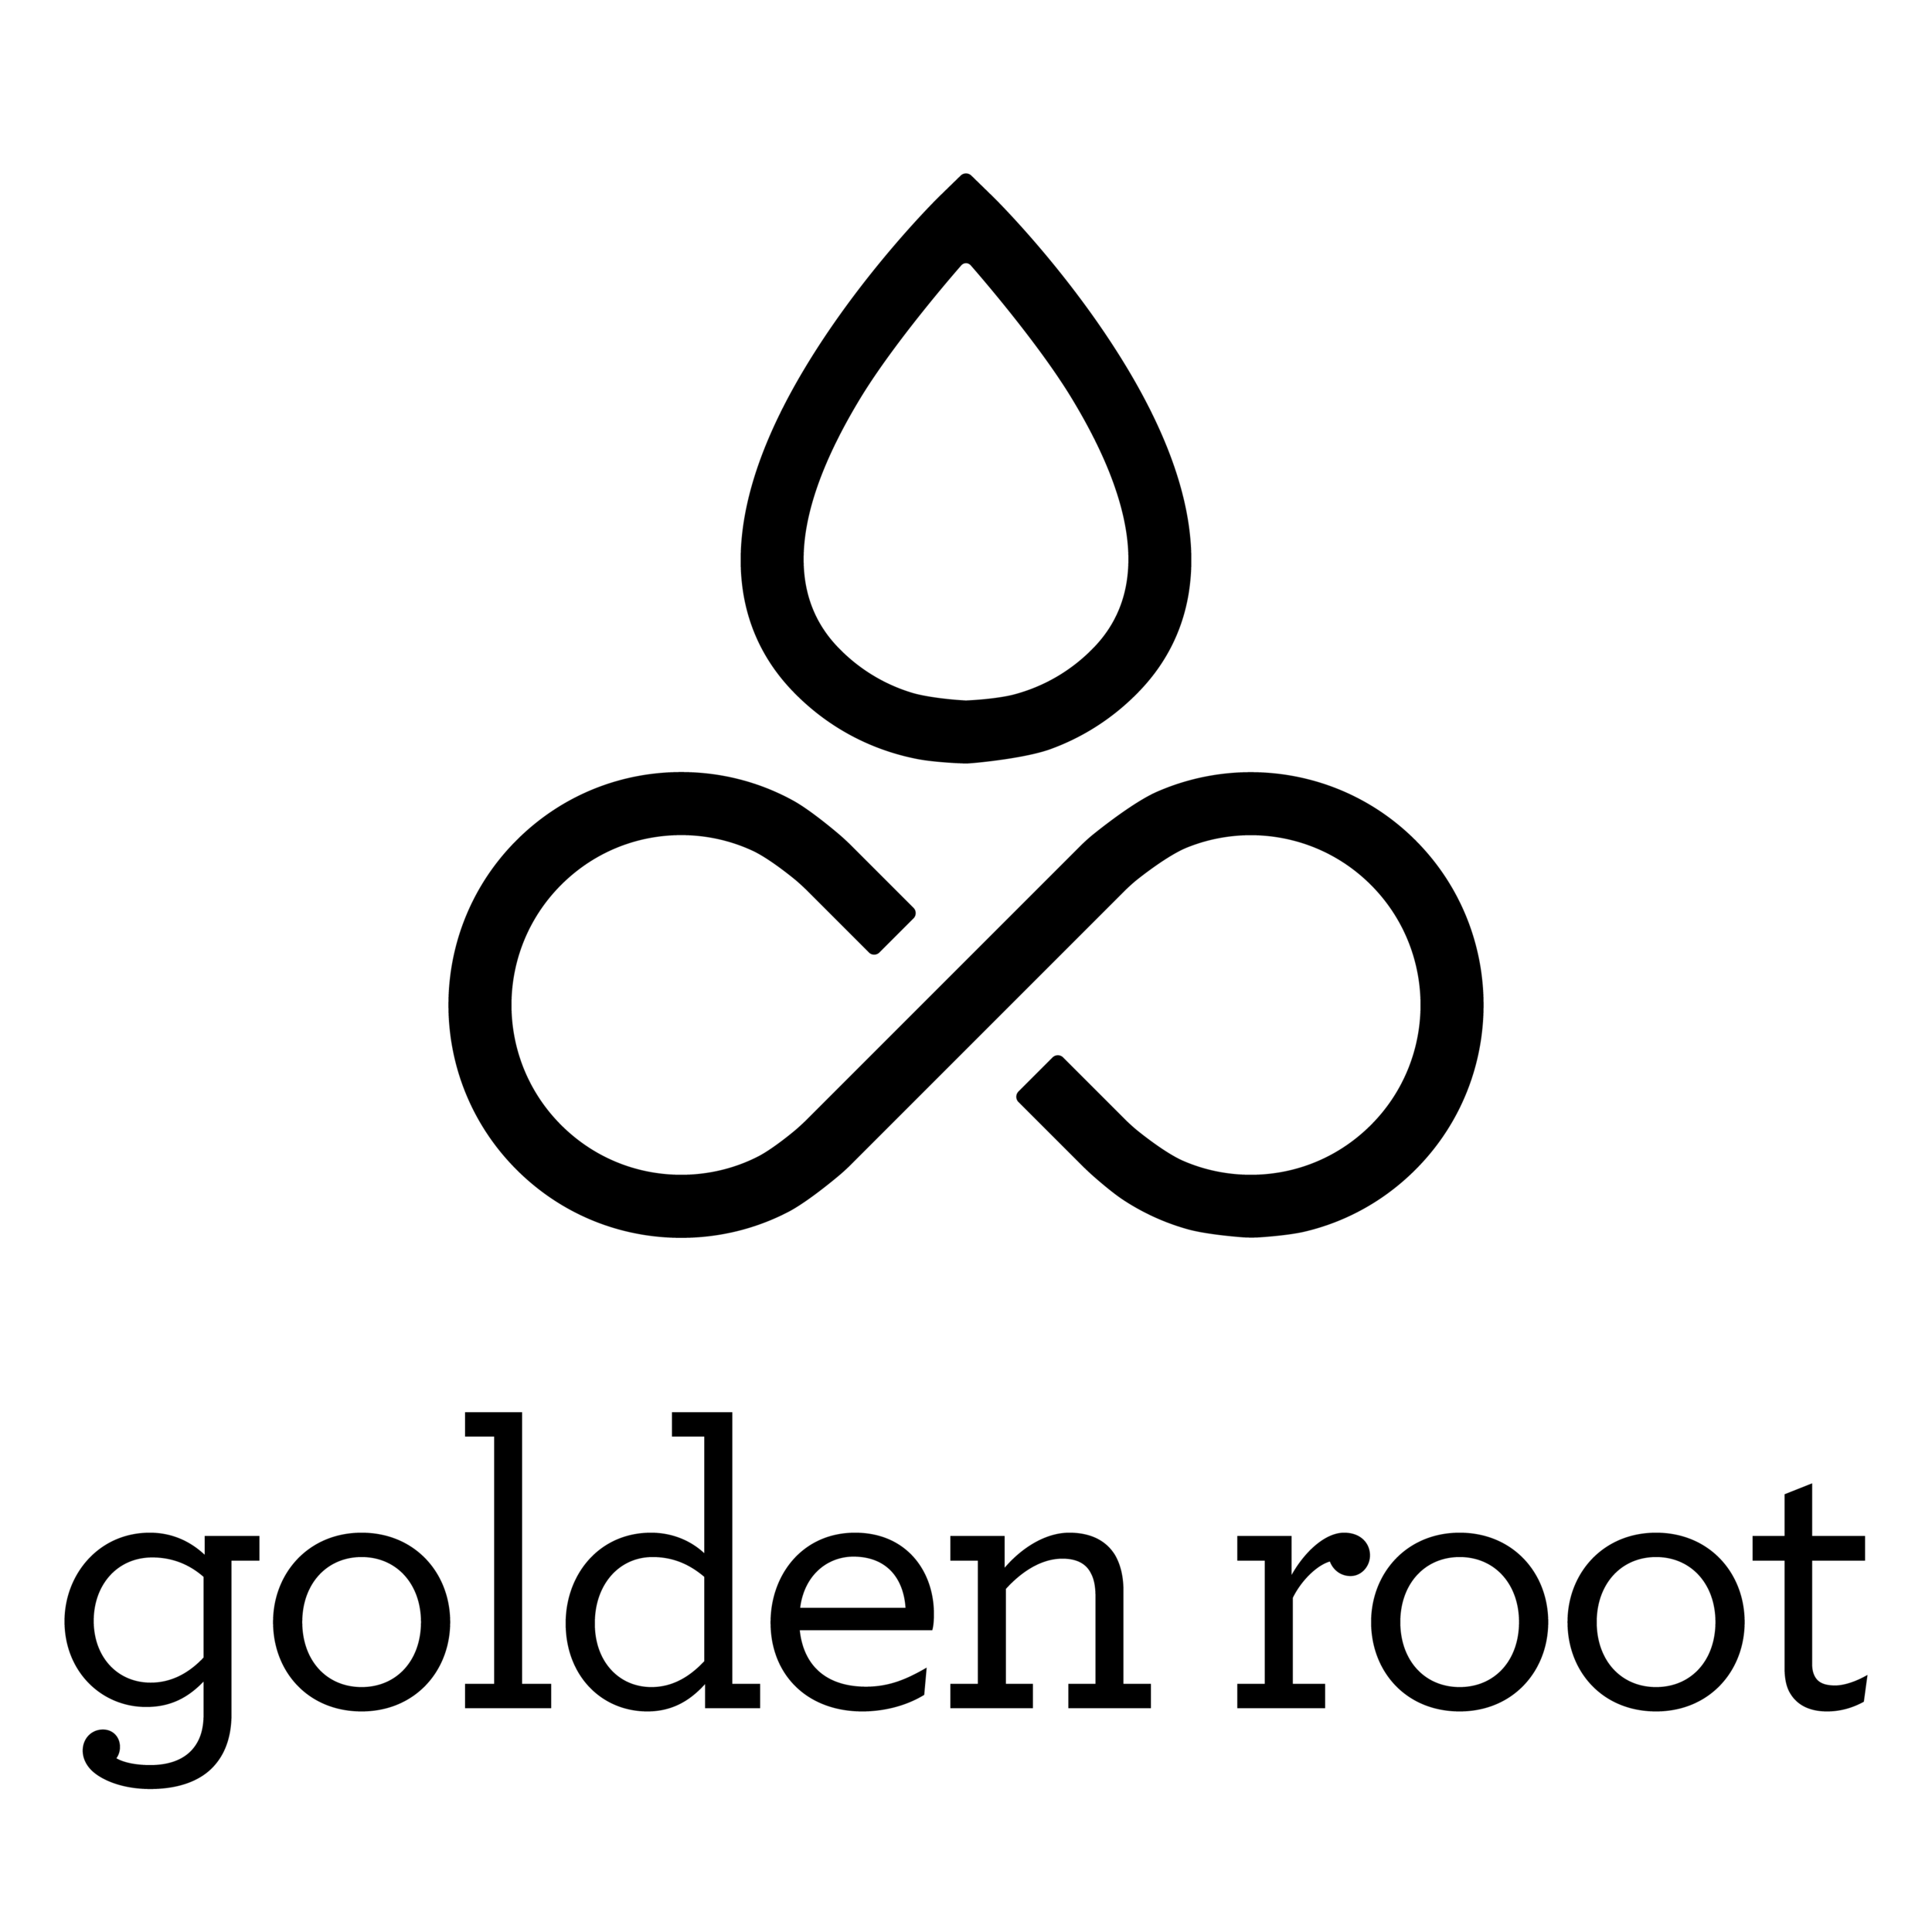 goldenroot_logo_stacked_black-01.png